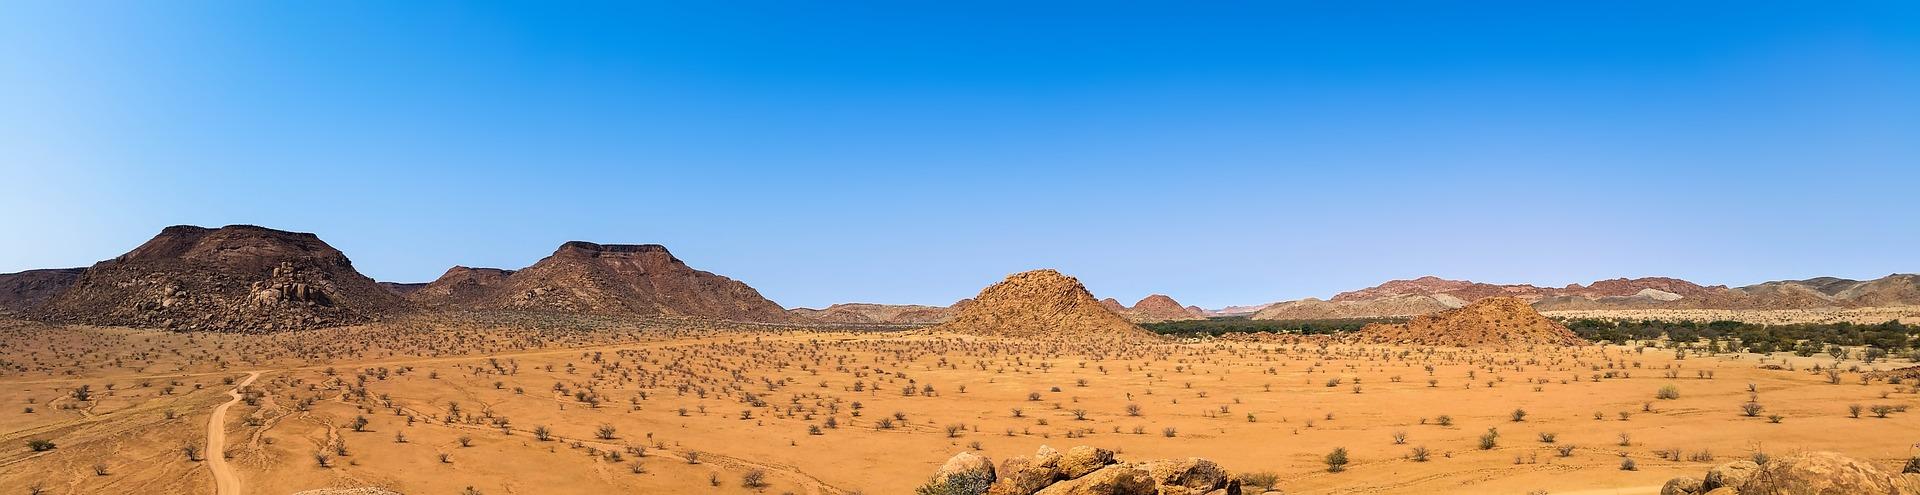 Give Me Land, Lots of Land! – Joshua 19 & Psalm 31:1-11